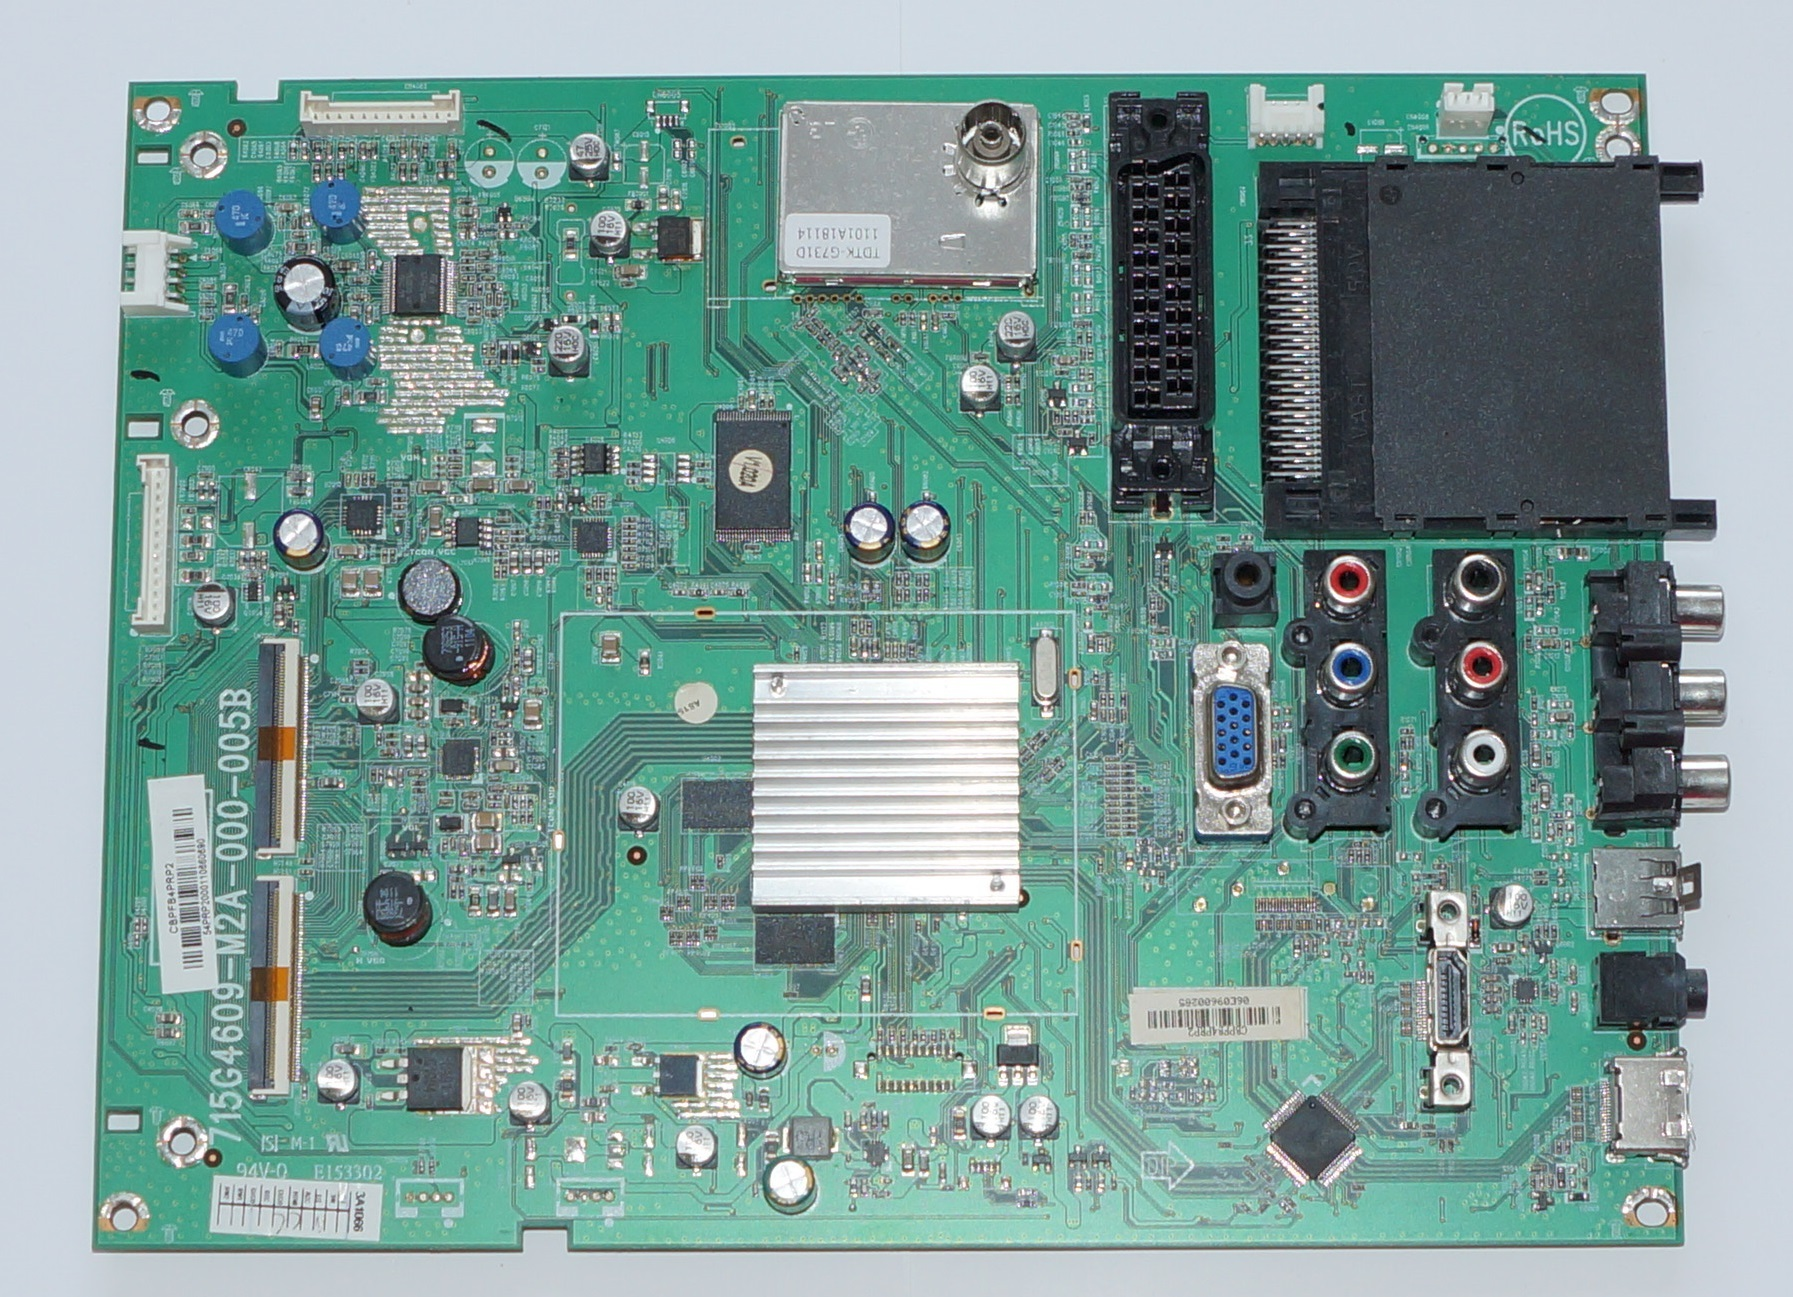 715G4609-M2A-000-005B mainboard телевизора Philips